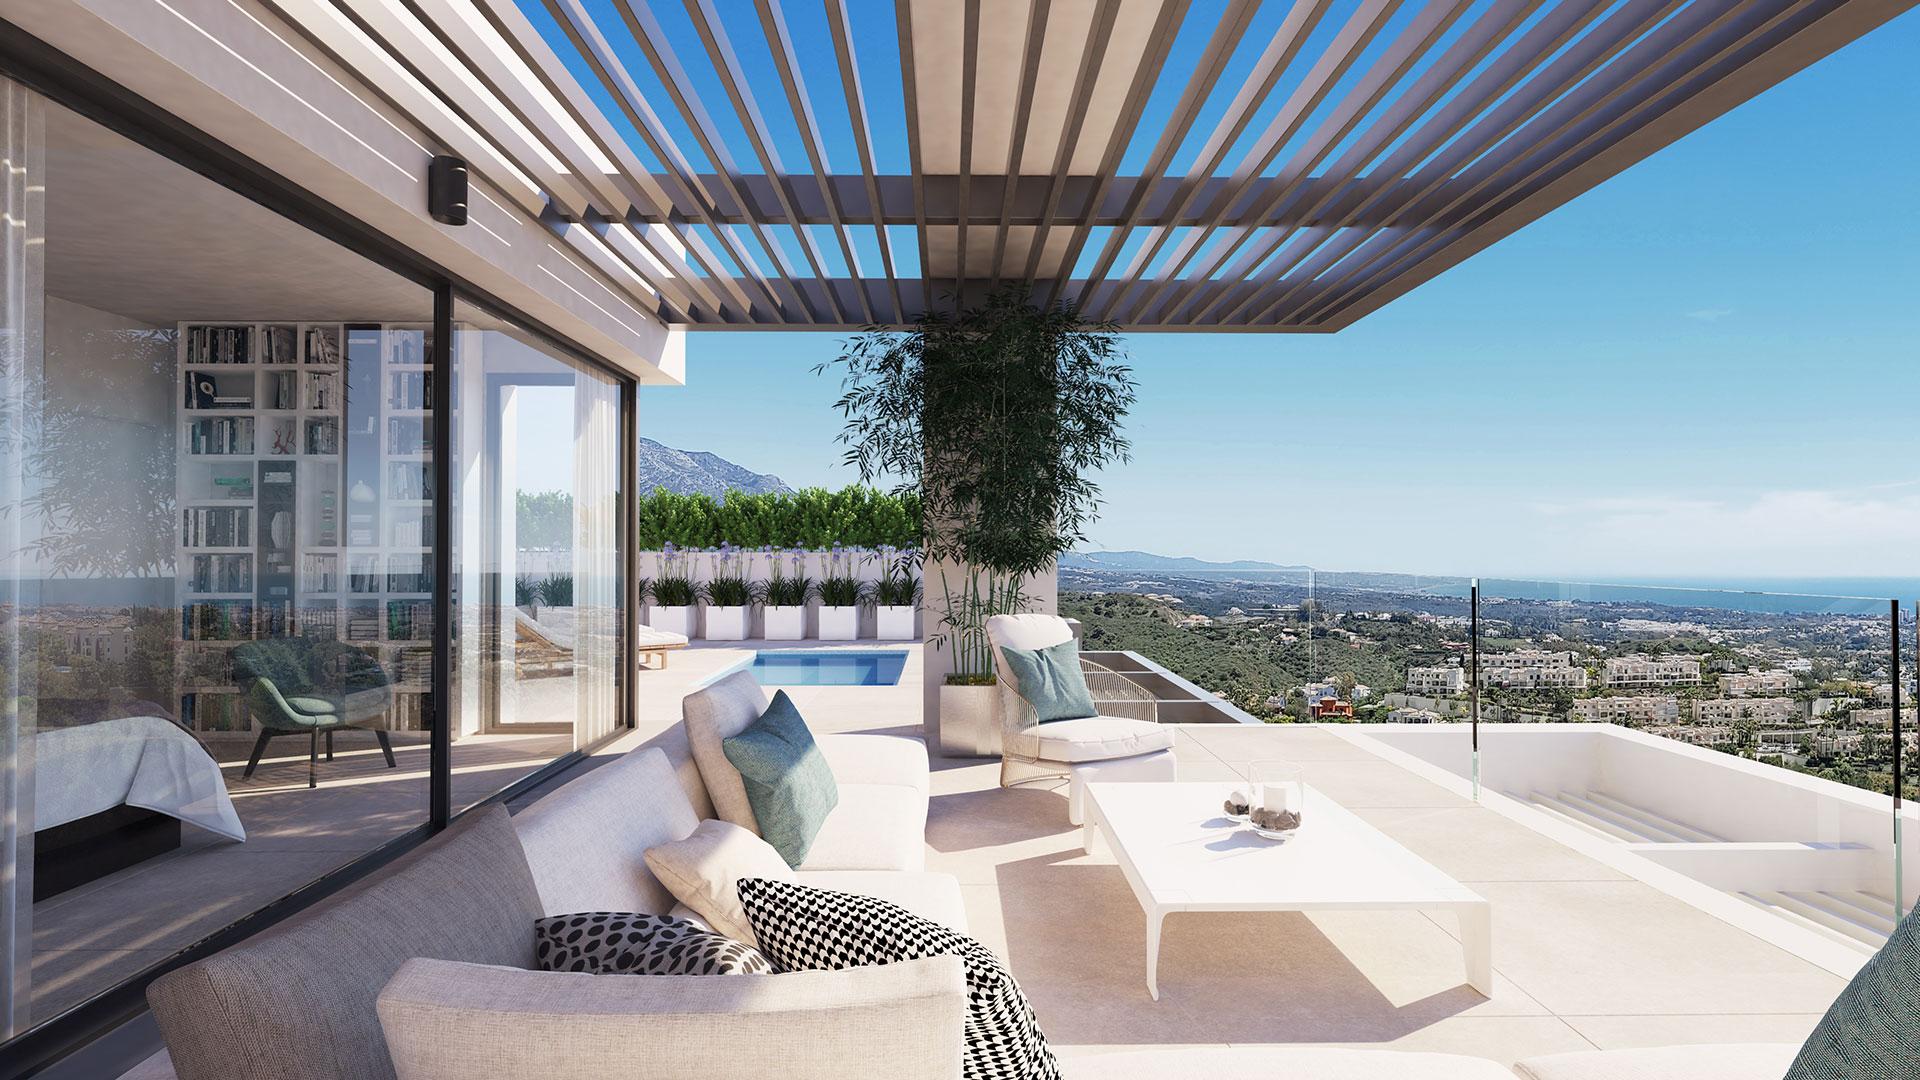 Wohnung in Marbella-Benahavis (Málaga)